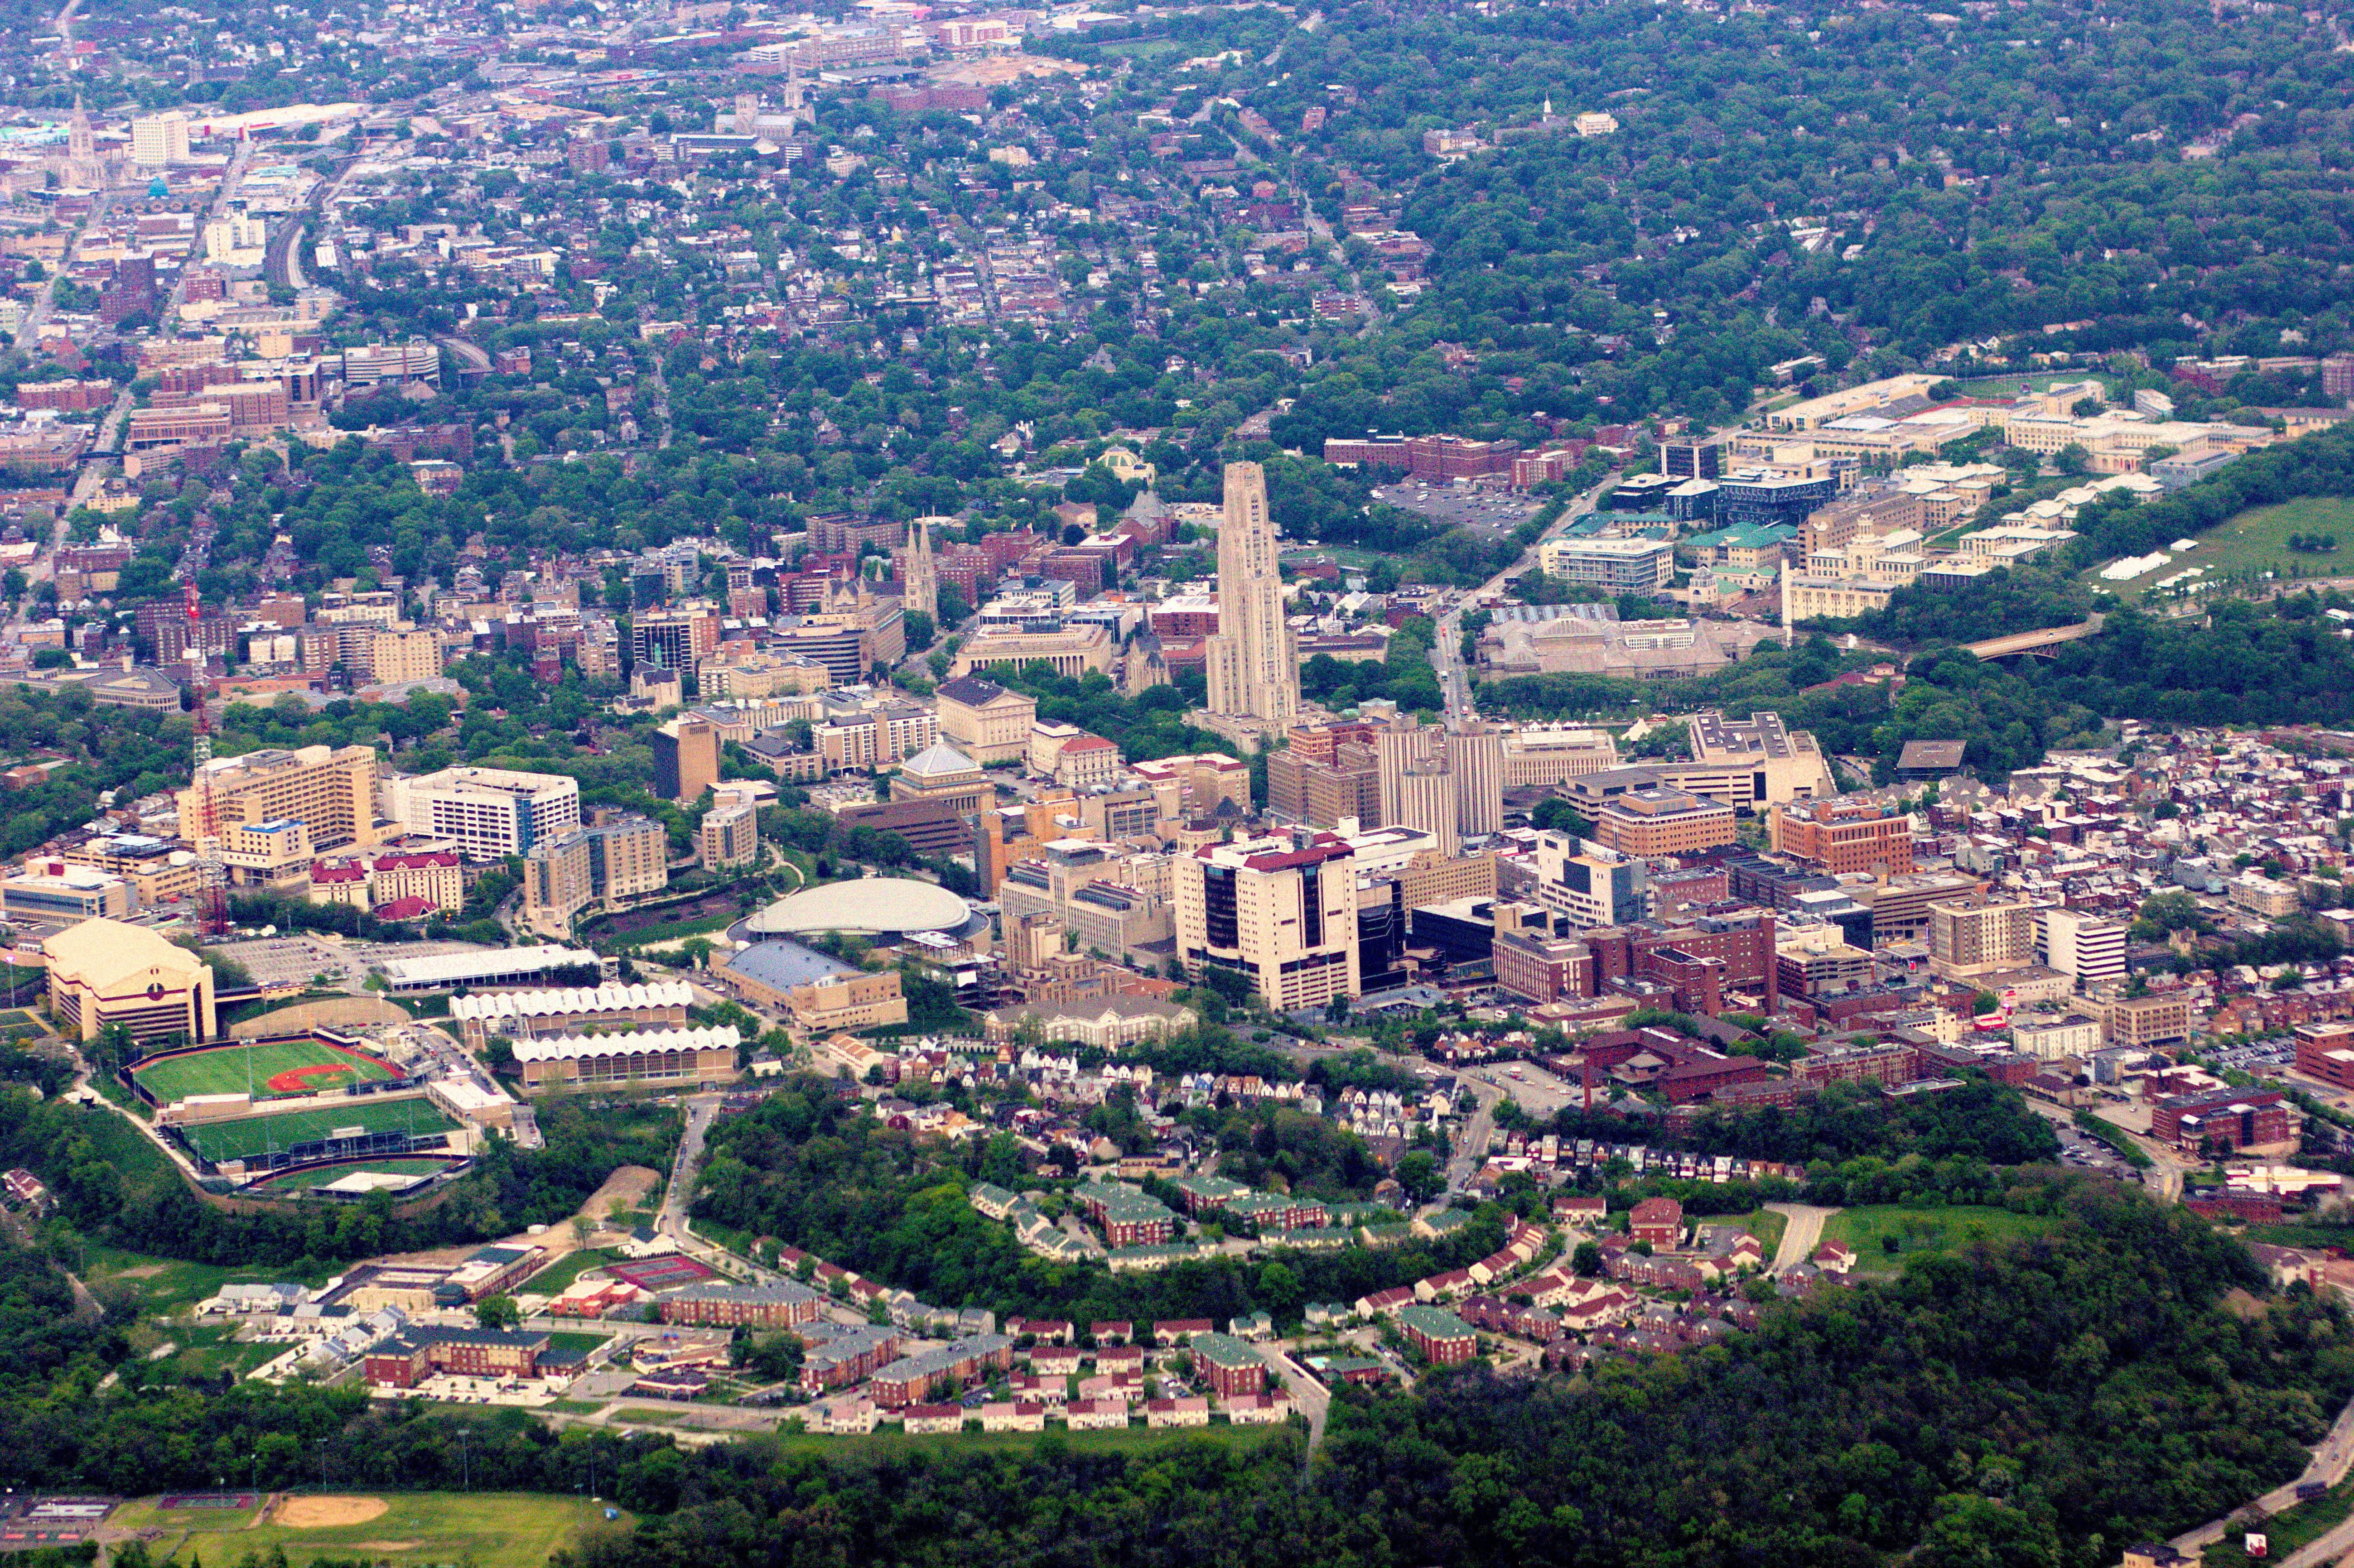 University City (Philly) Vs. Oakland (Pittsburgh